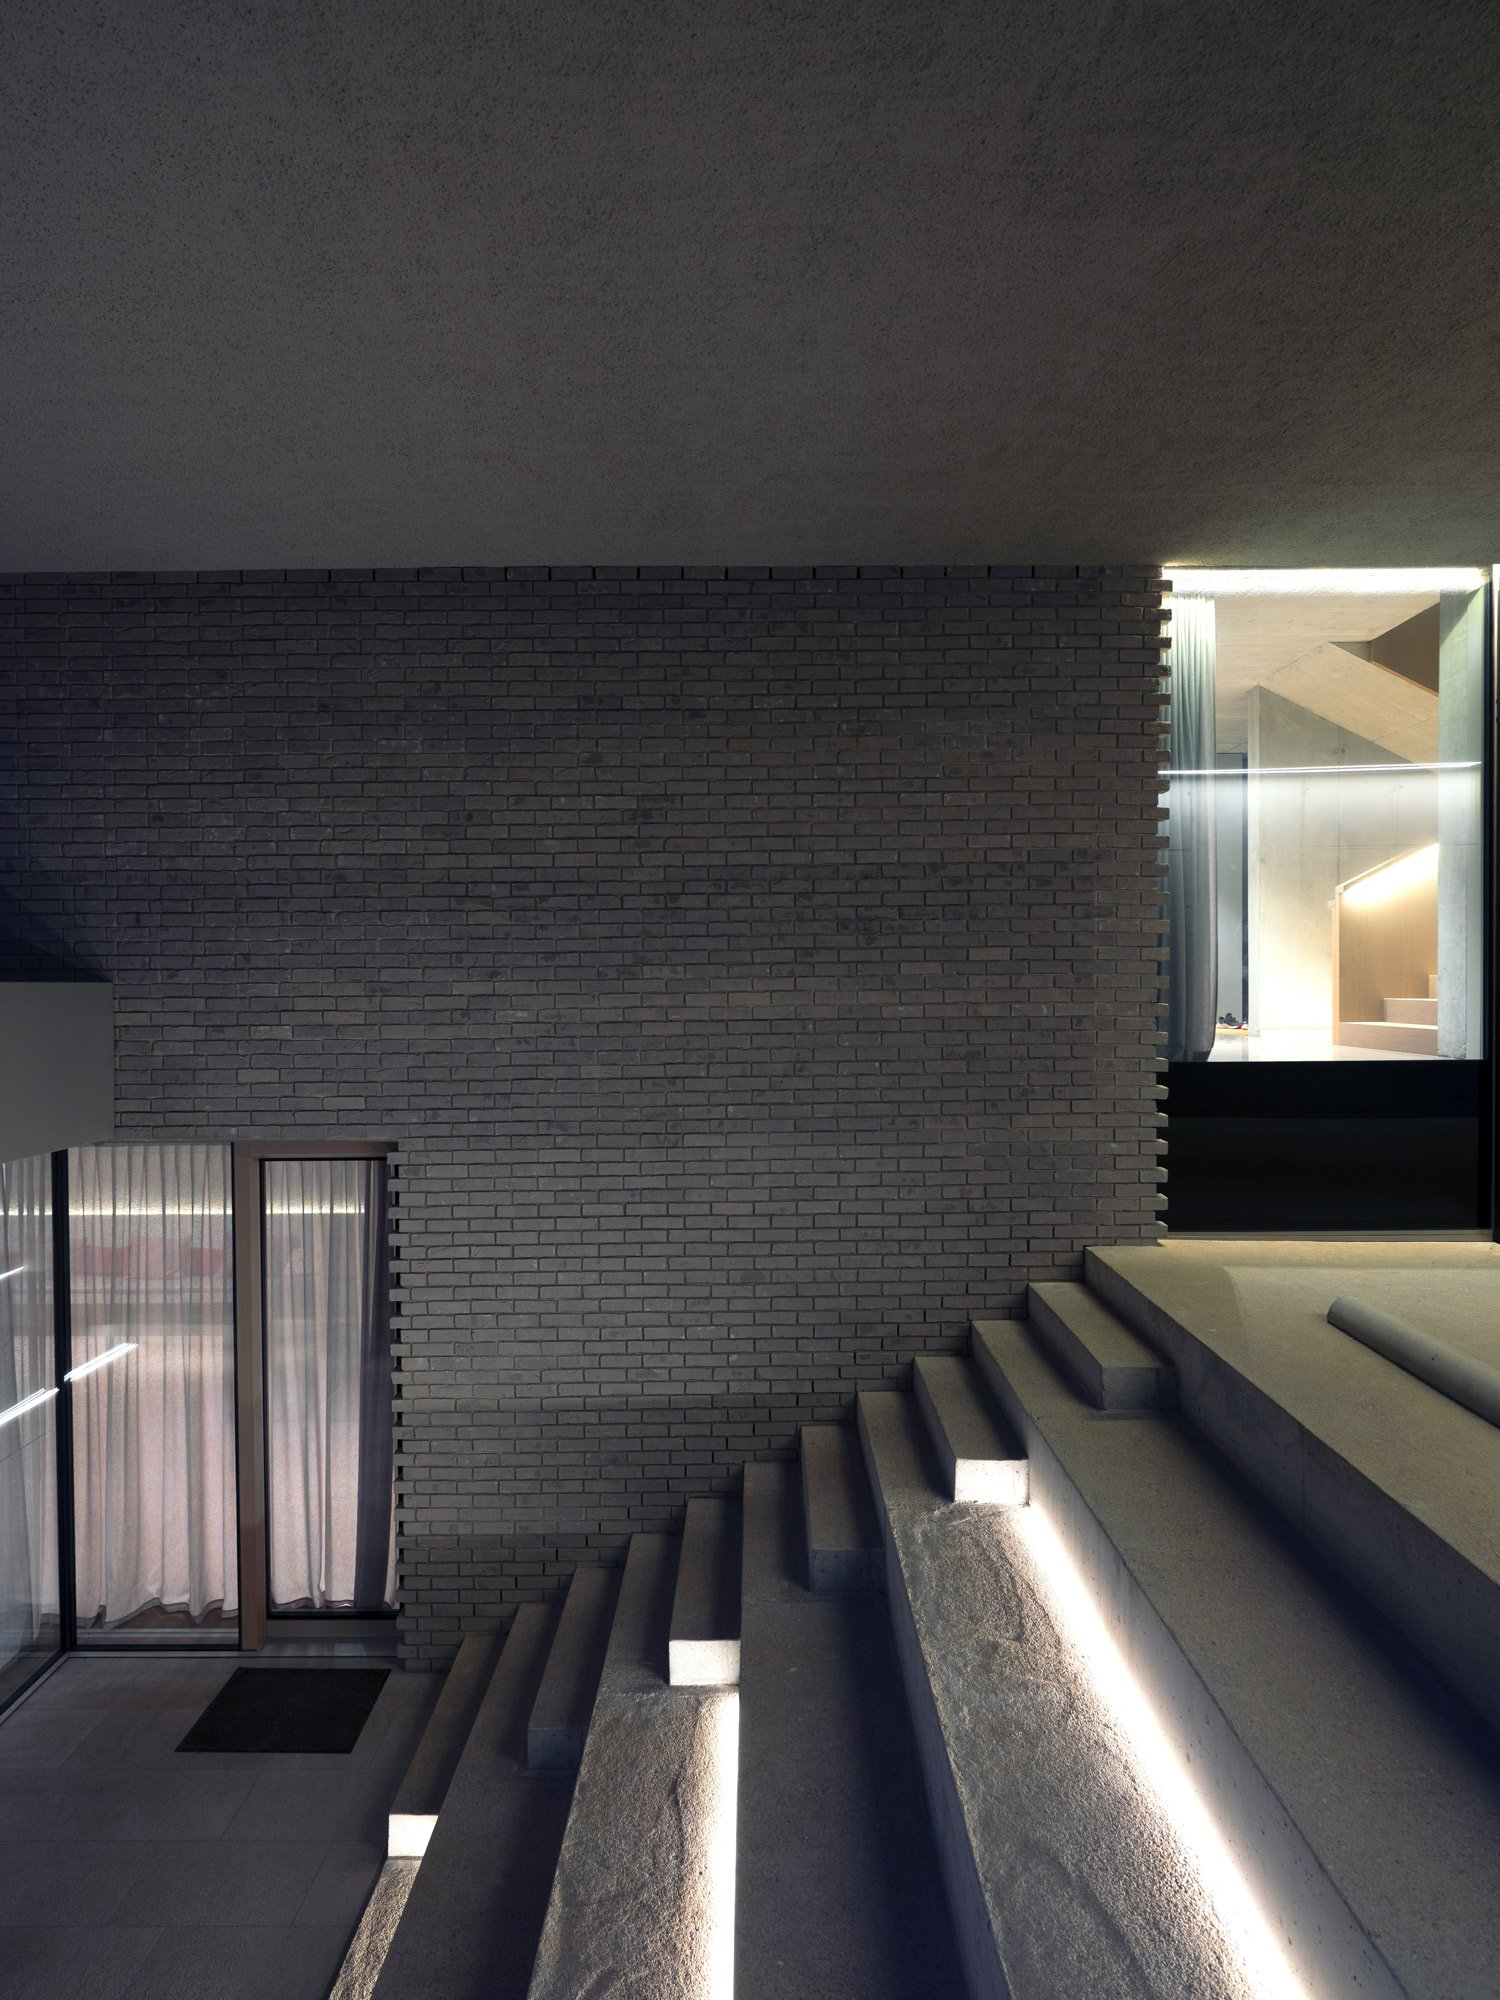 Step Level House © Tomaž Gregorič